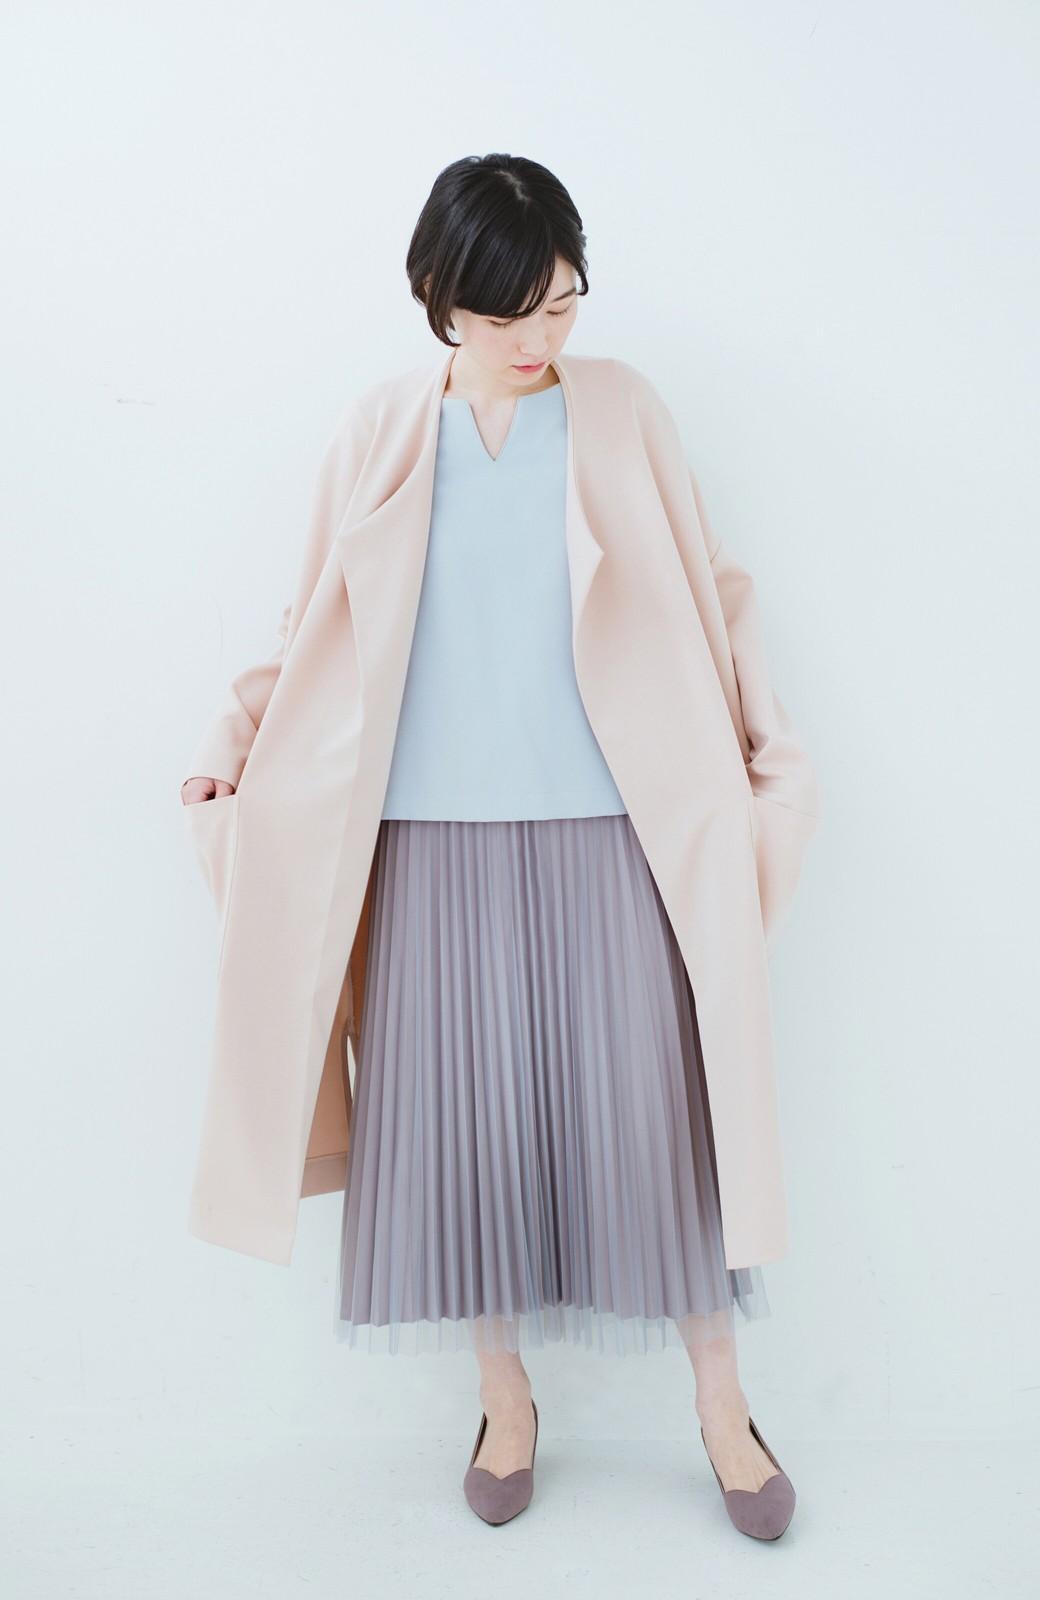 haco! どんな日も華やか気分にしてくれる 二枚仕立てのチュールプリーツスカート <ライトグレー>の商品写真19